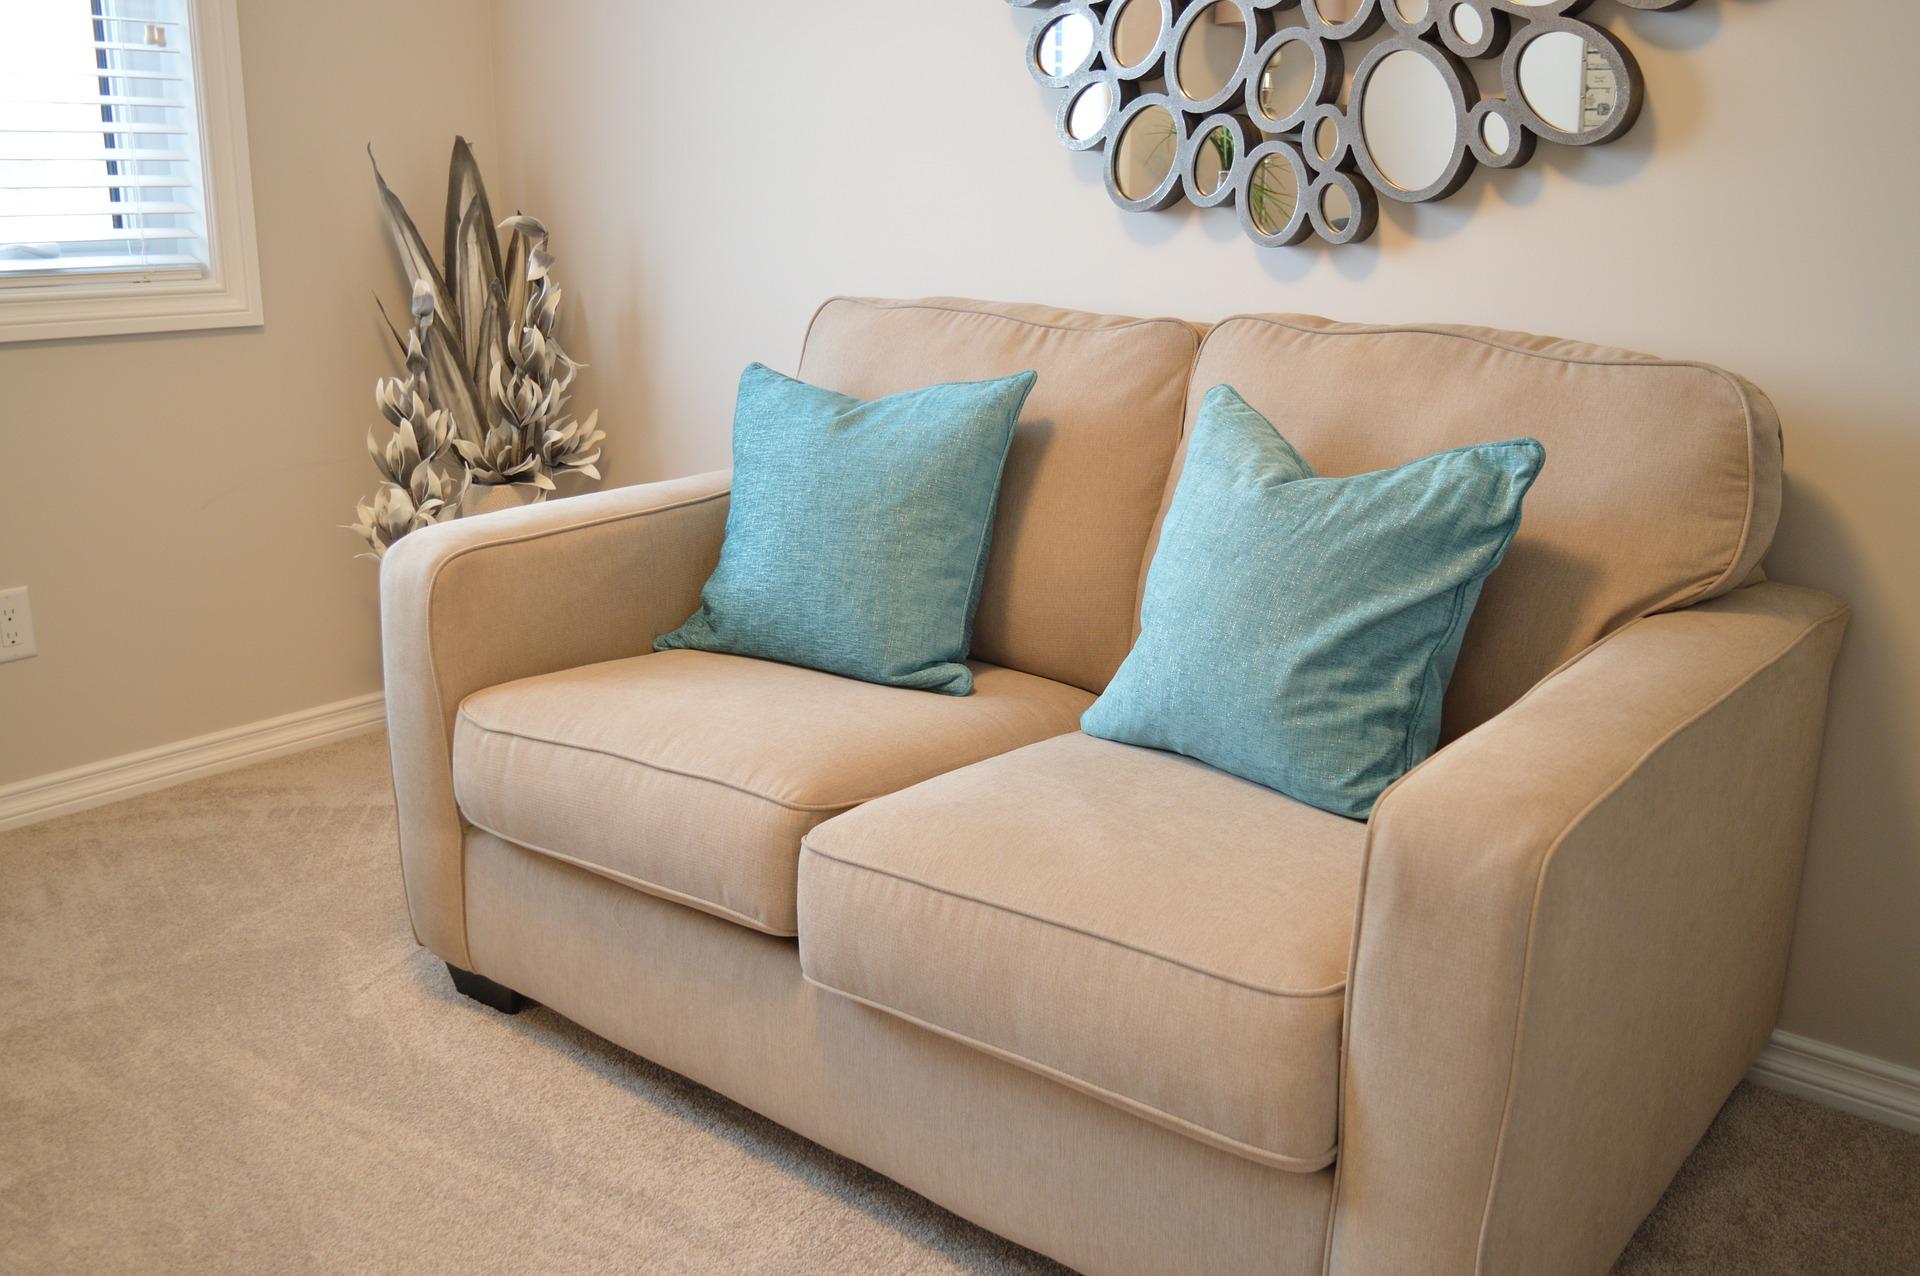 Fullsize Of Improvements Home Decor